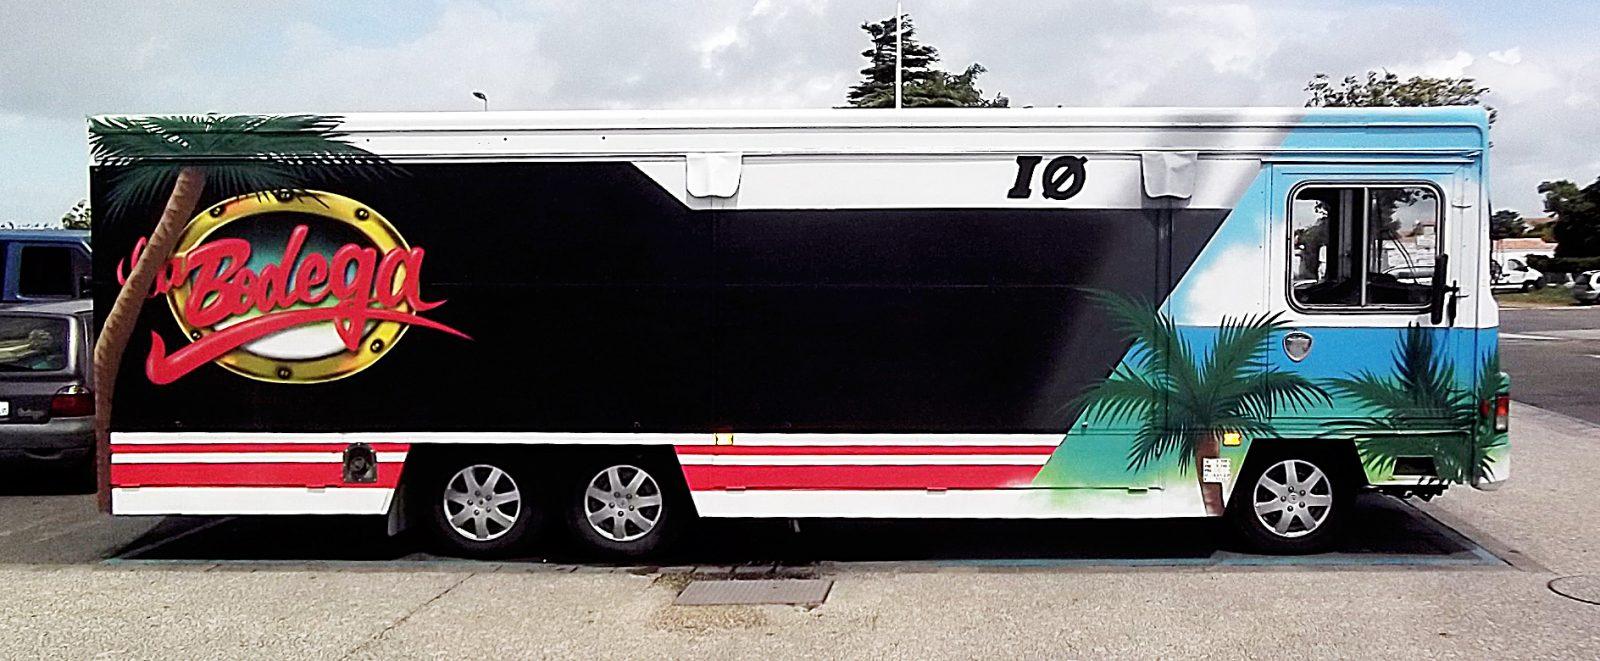 Déco-Camion-restaurant-Food-Truck-La-Bodega